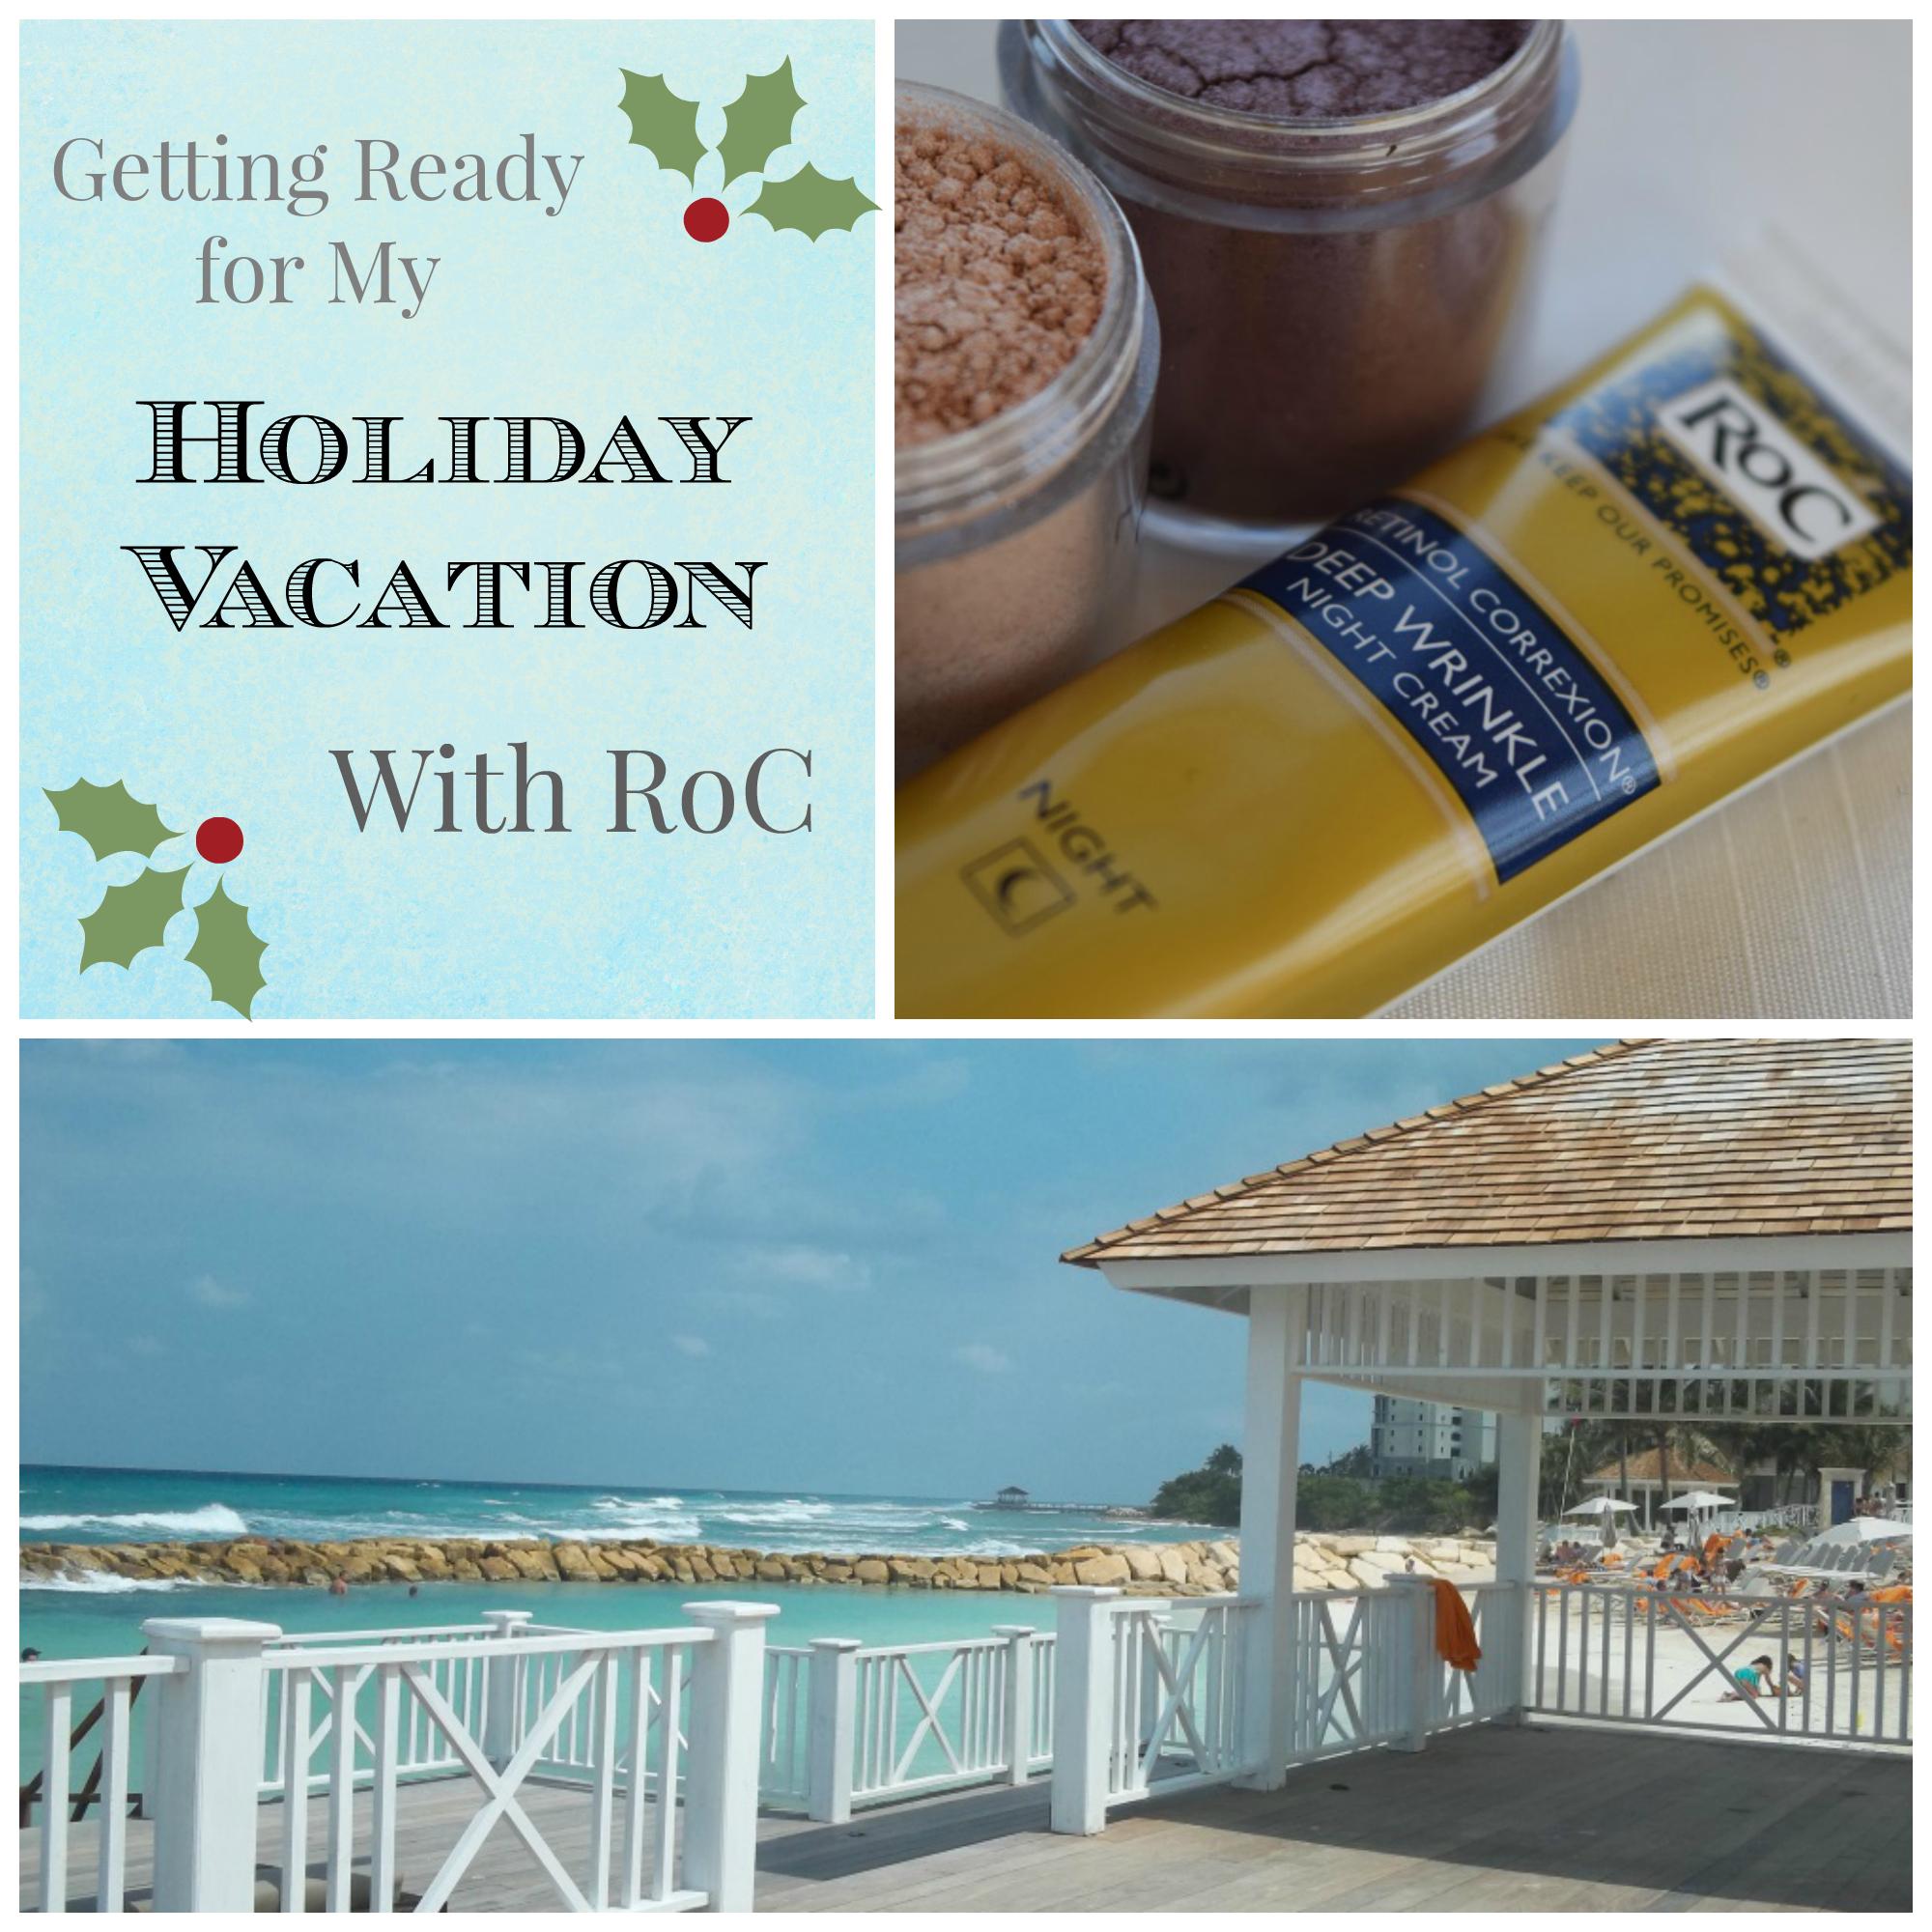 ROC Holiday Vacation